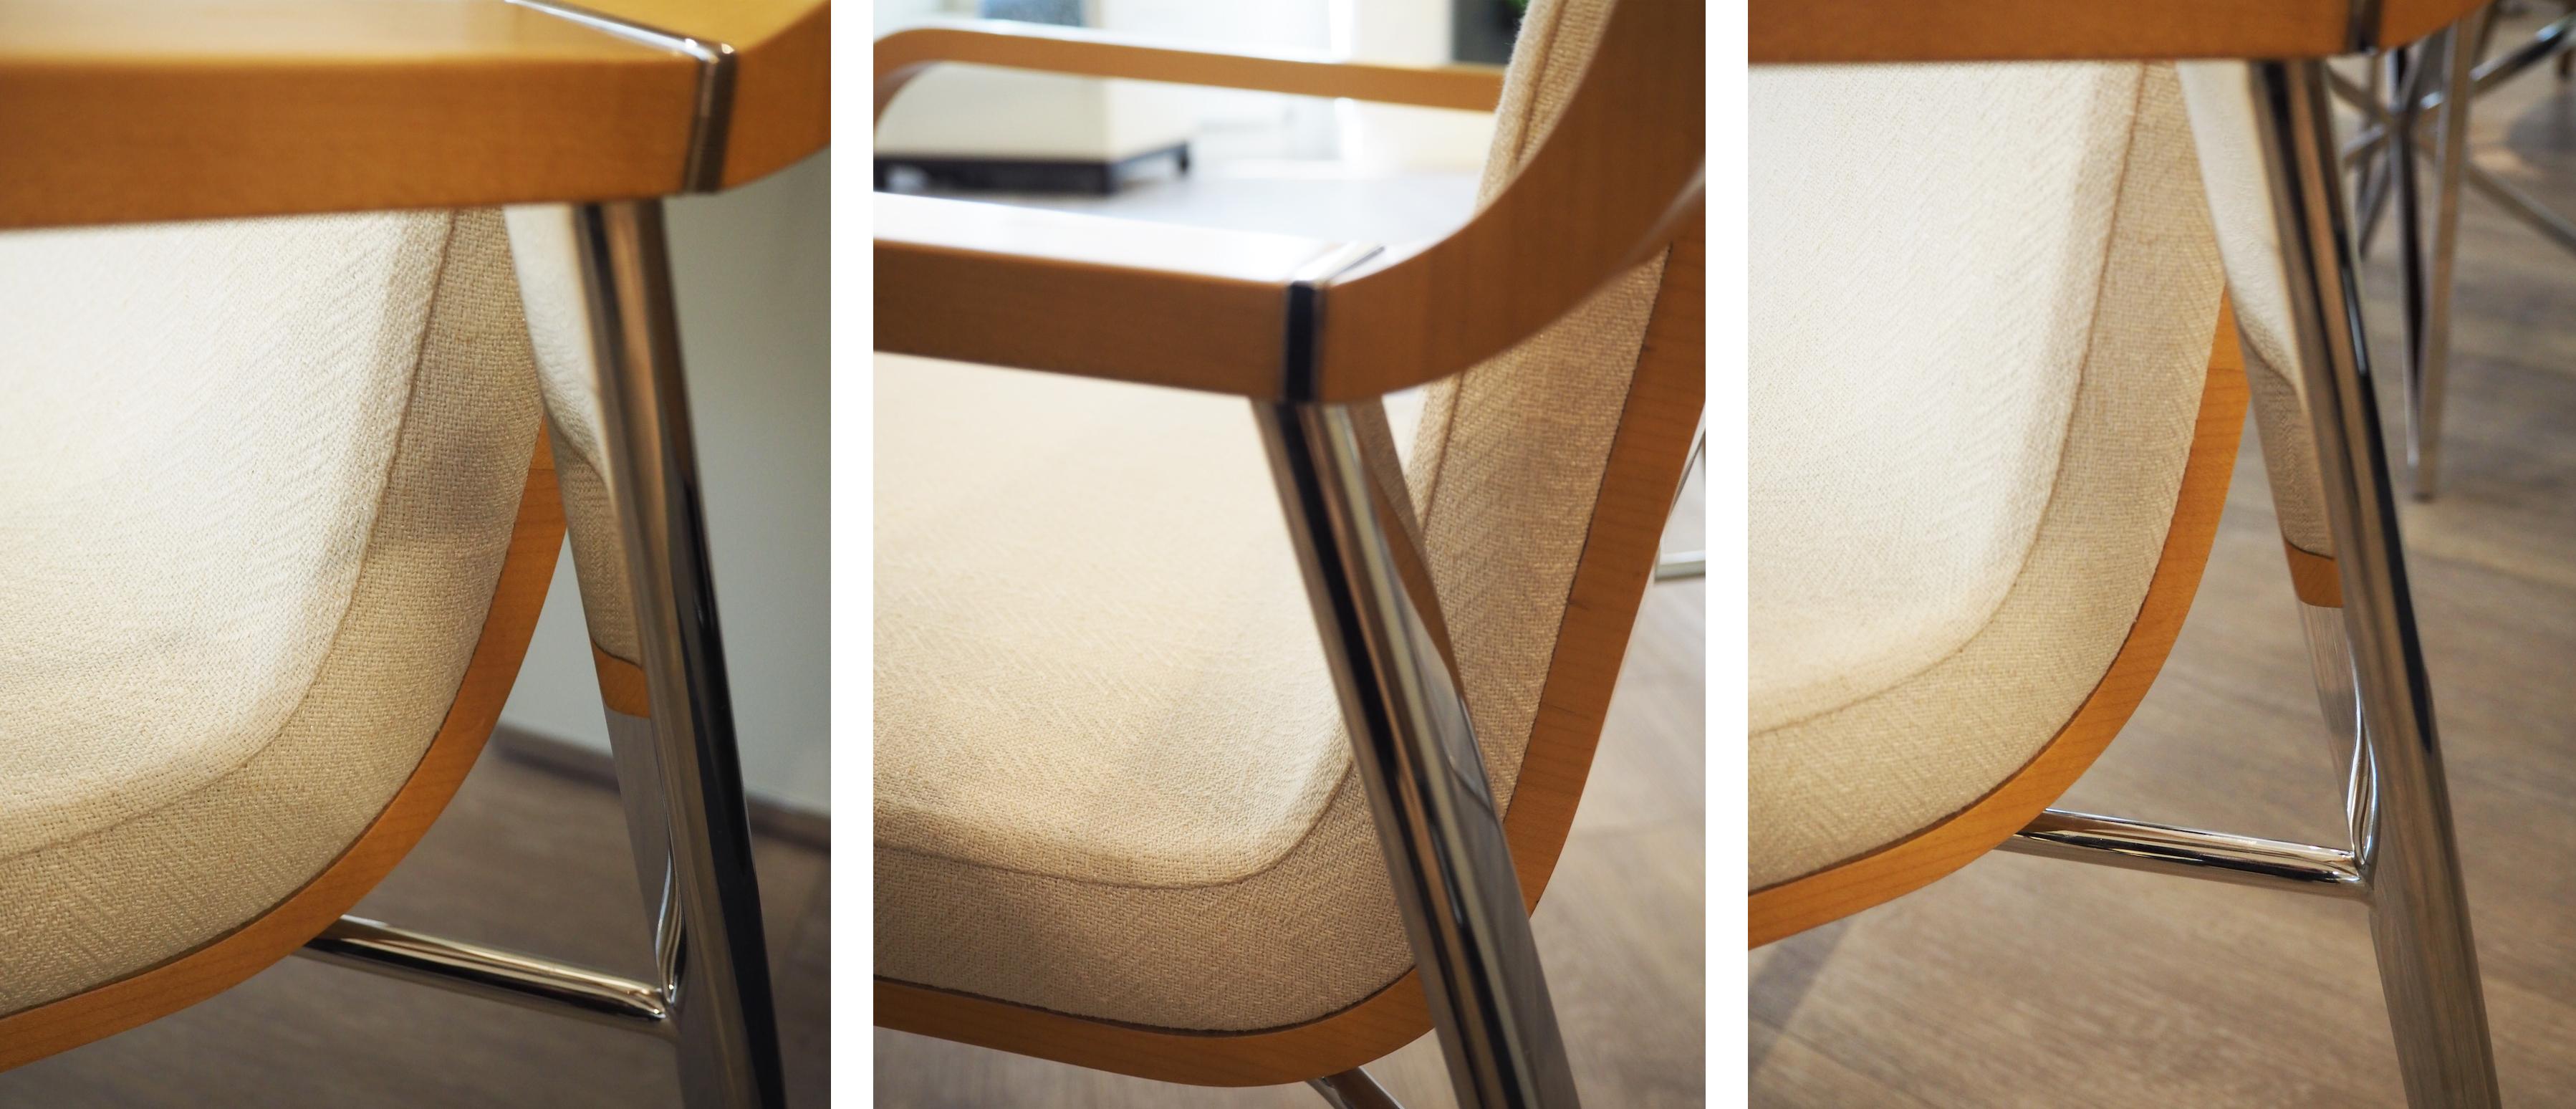 Nocca-decca-london-office-furniture-guest-chair